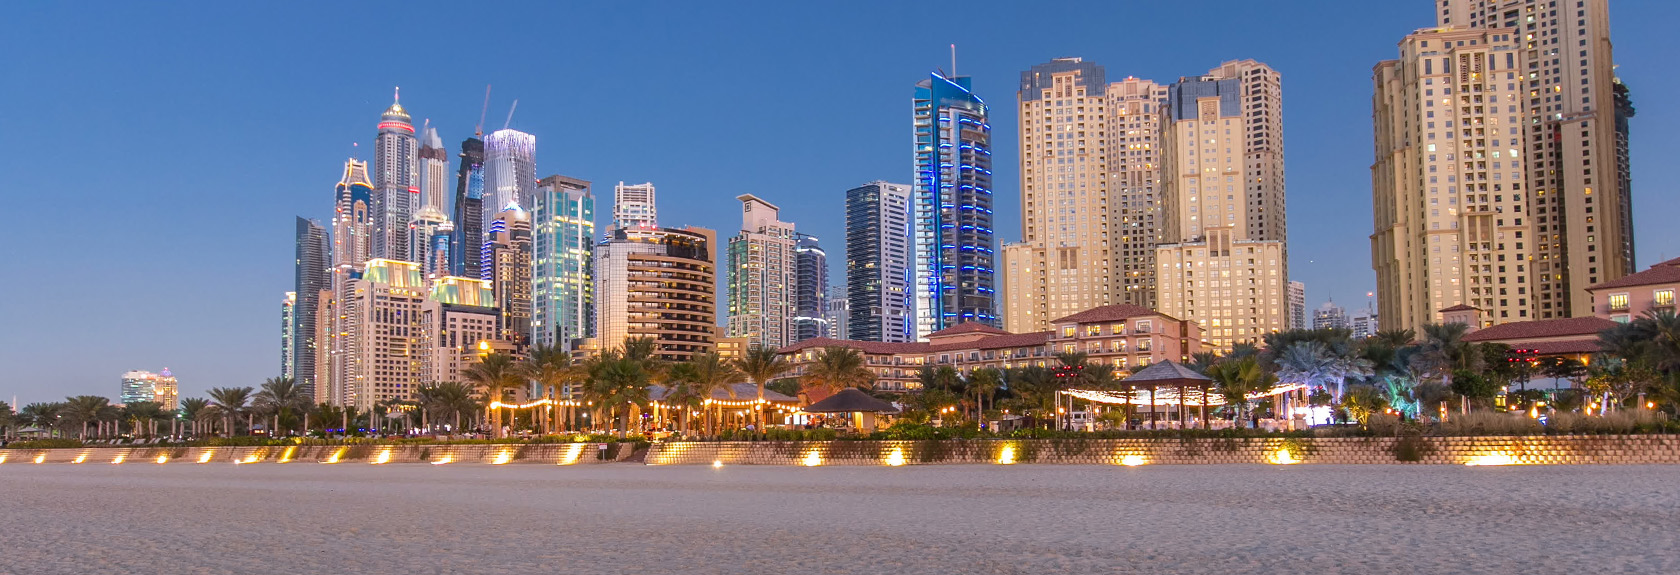 The Beach at JBR (Dubai Marina)